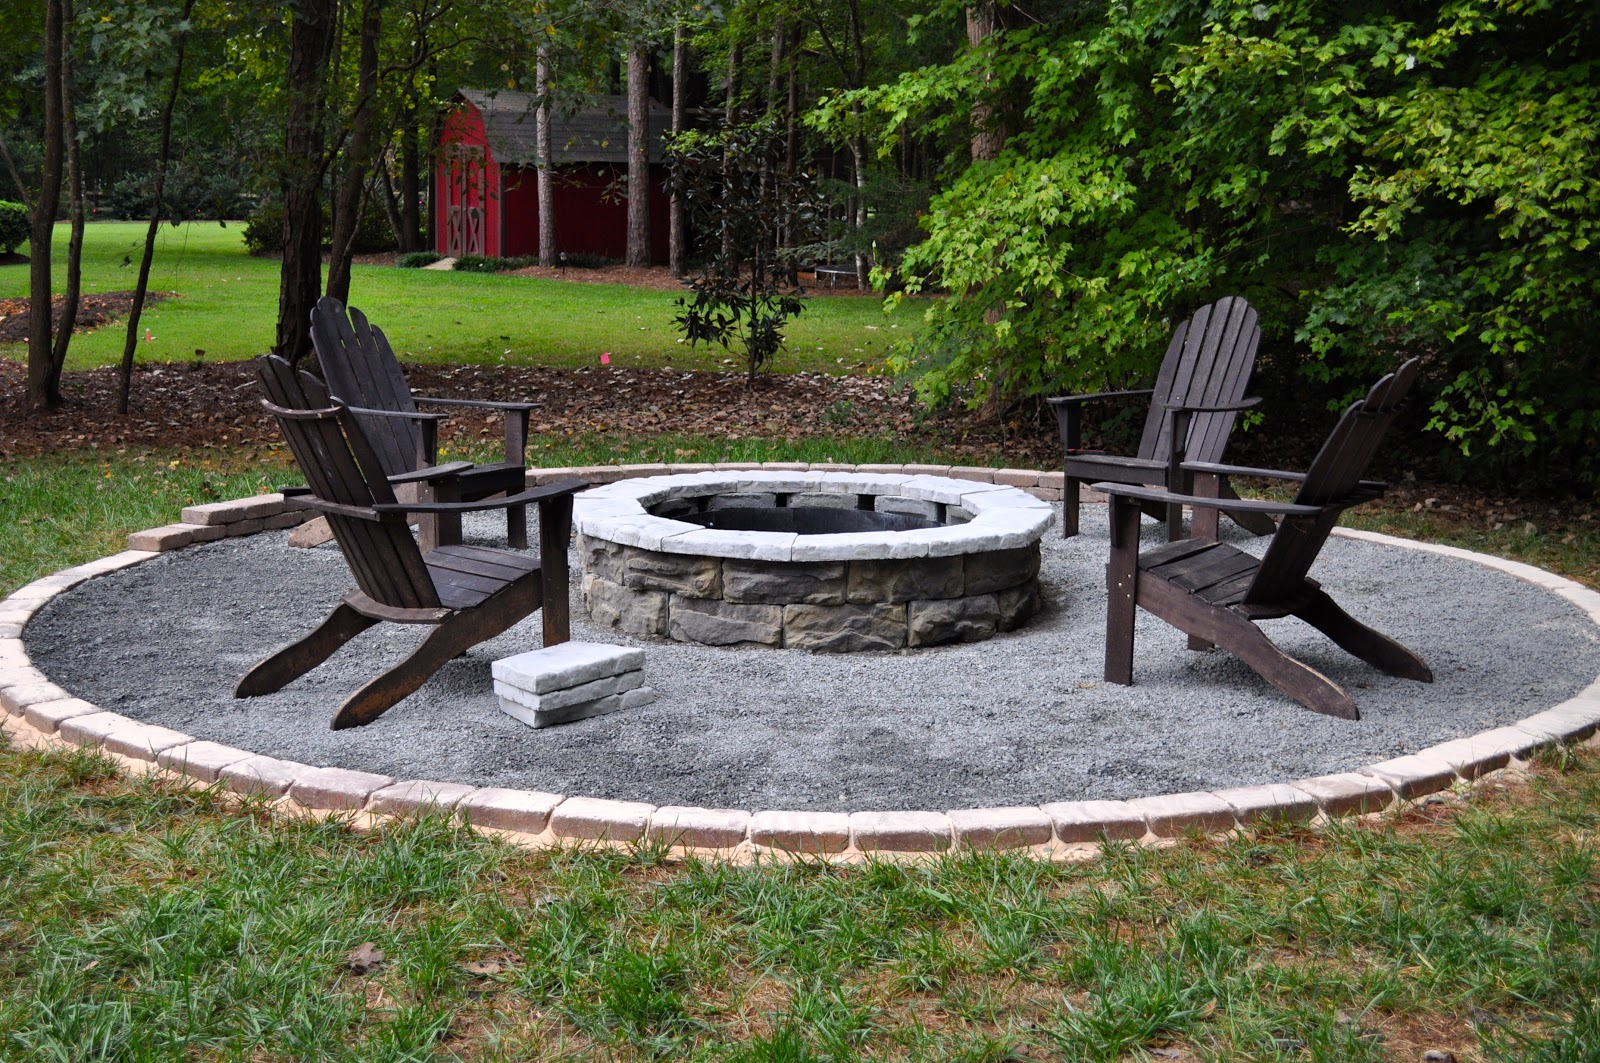 diy backyard fire pit ideas photo - 2